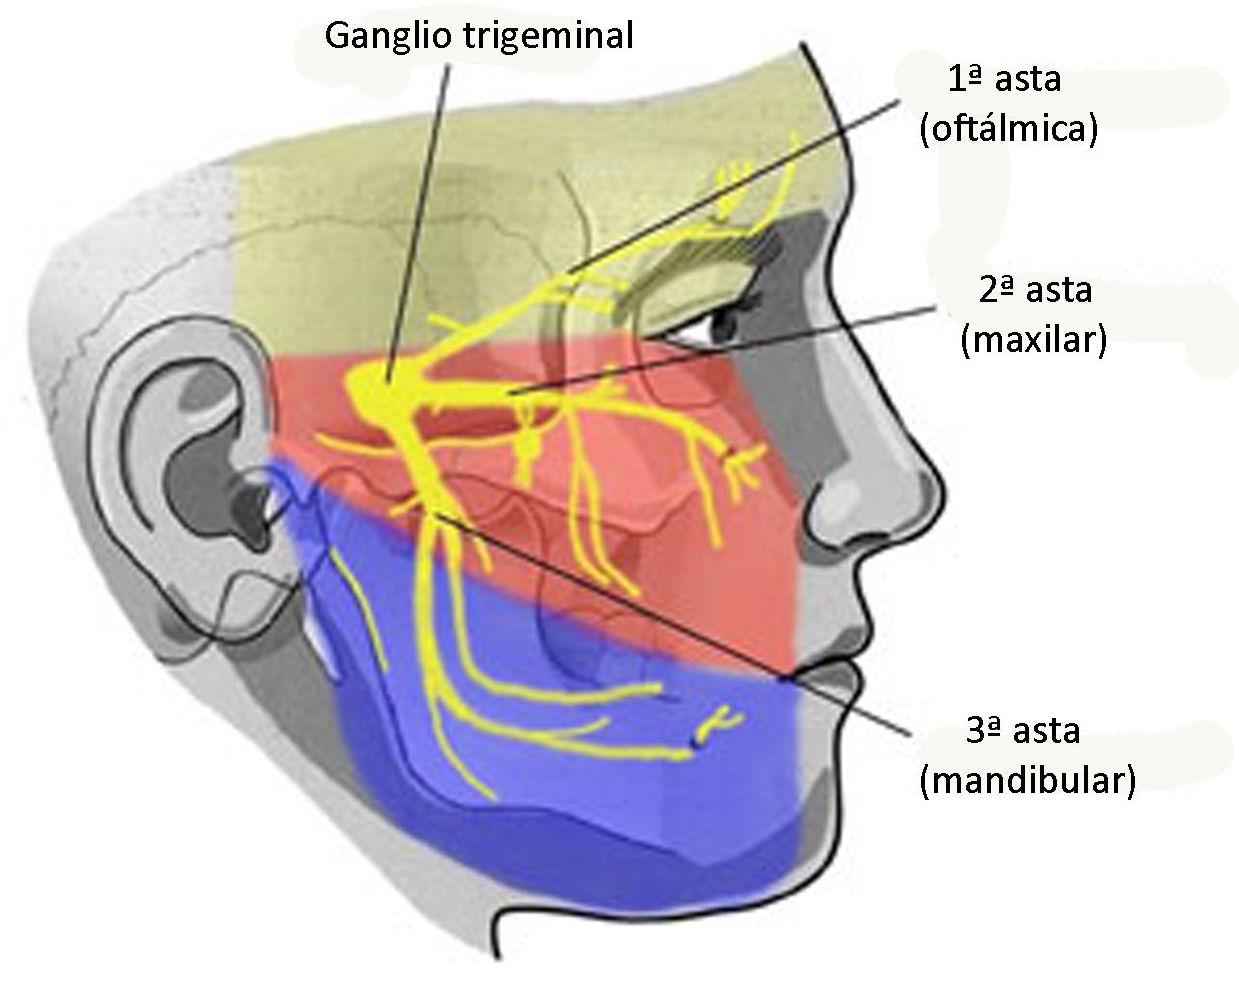 Neuralgias de trigemino: Servicios de Jull Acupuntura